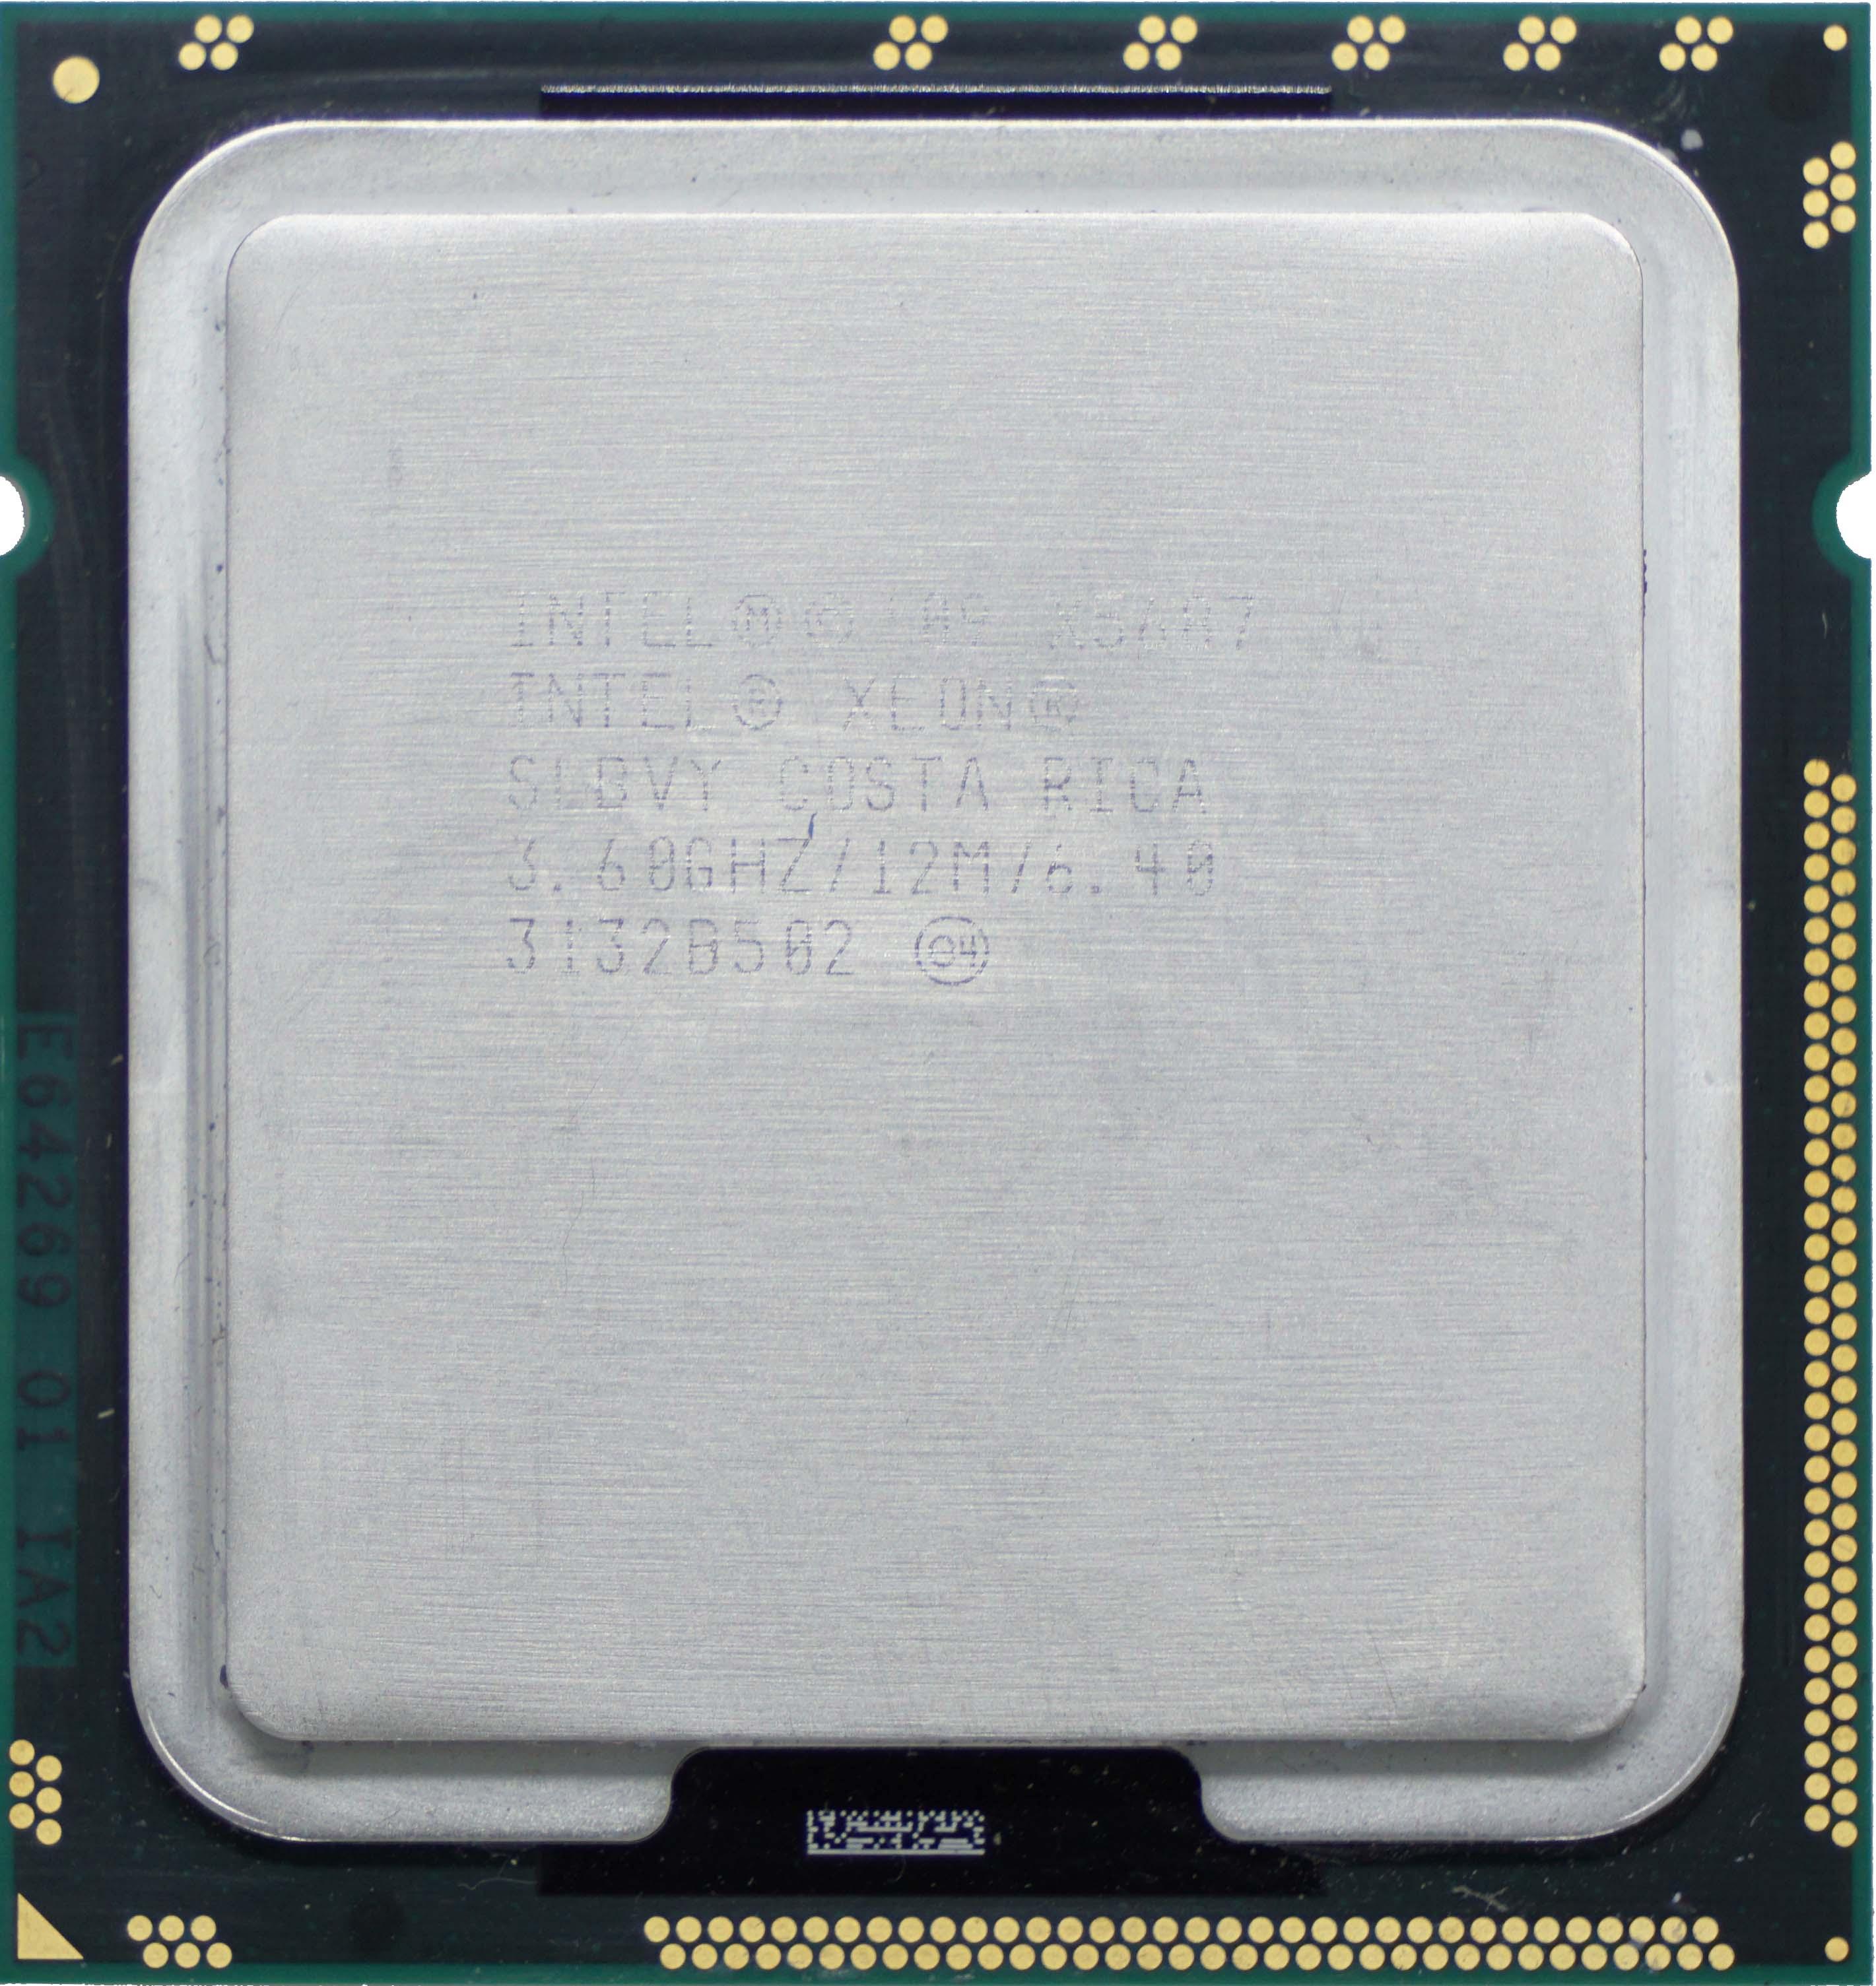 Details about Intel Xeon X5687 (SLBVY) 3 60GHz 4-Core LGA1366 CPU